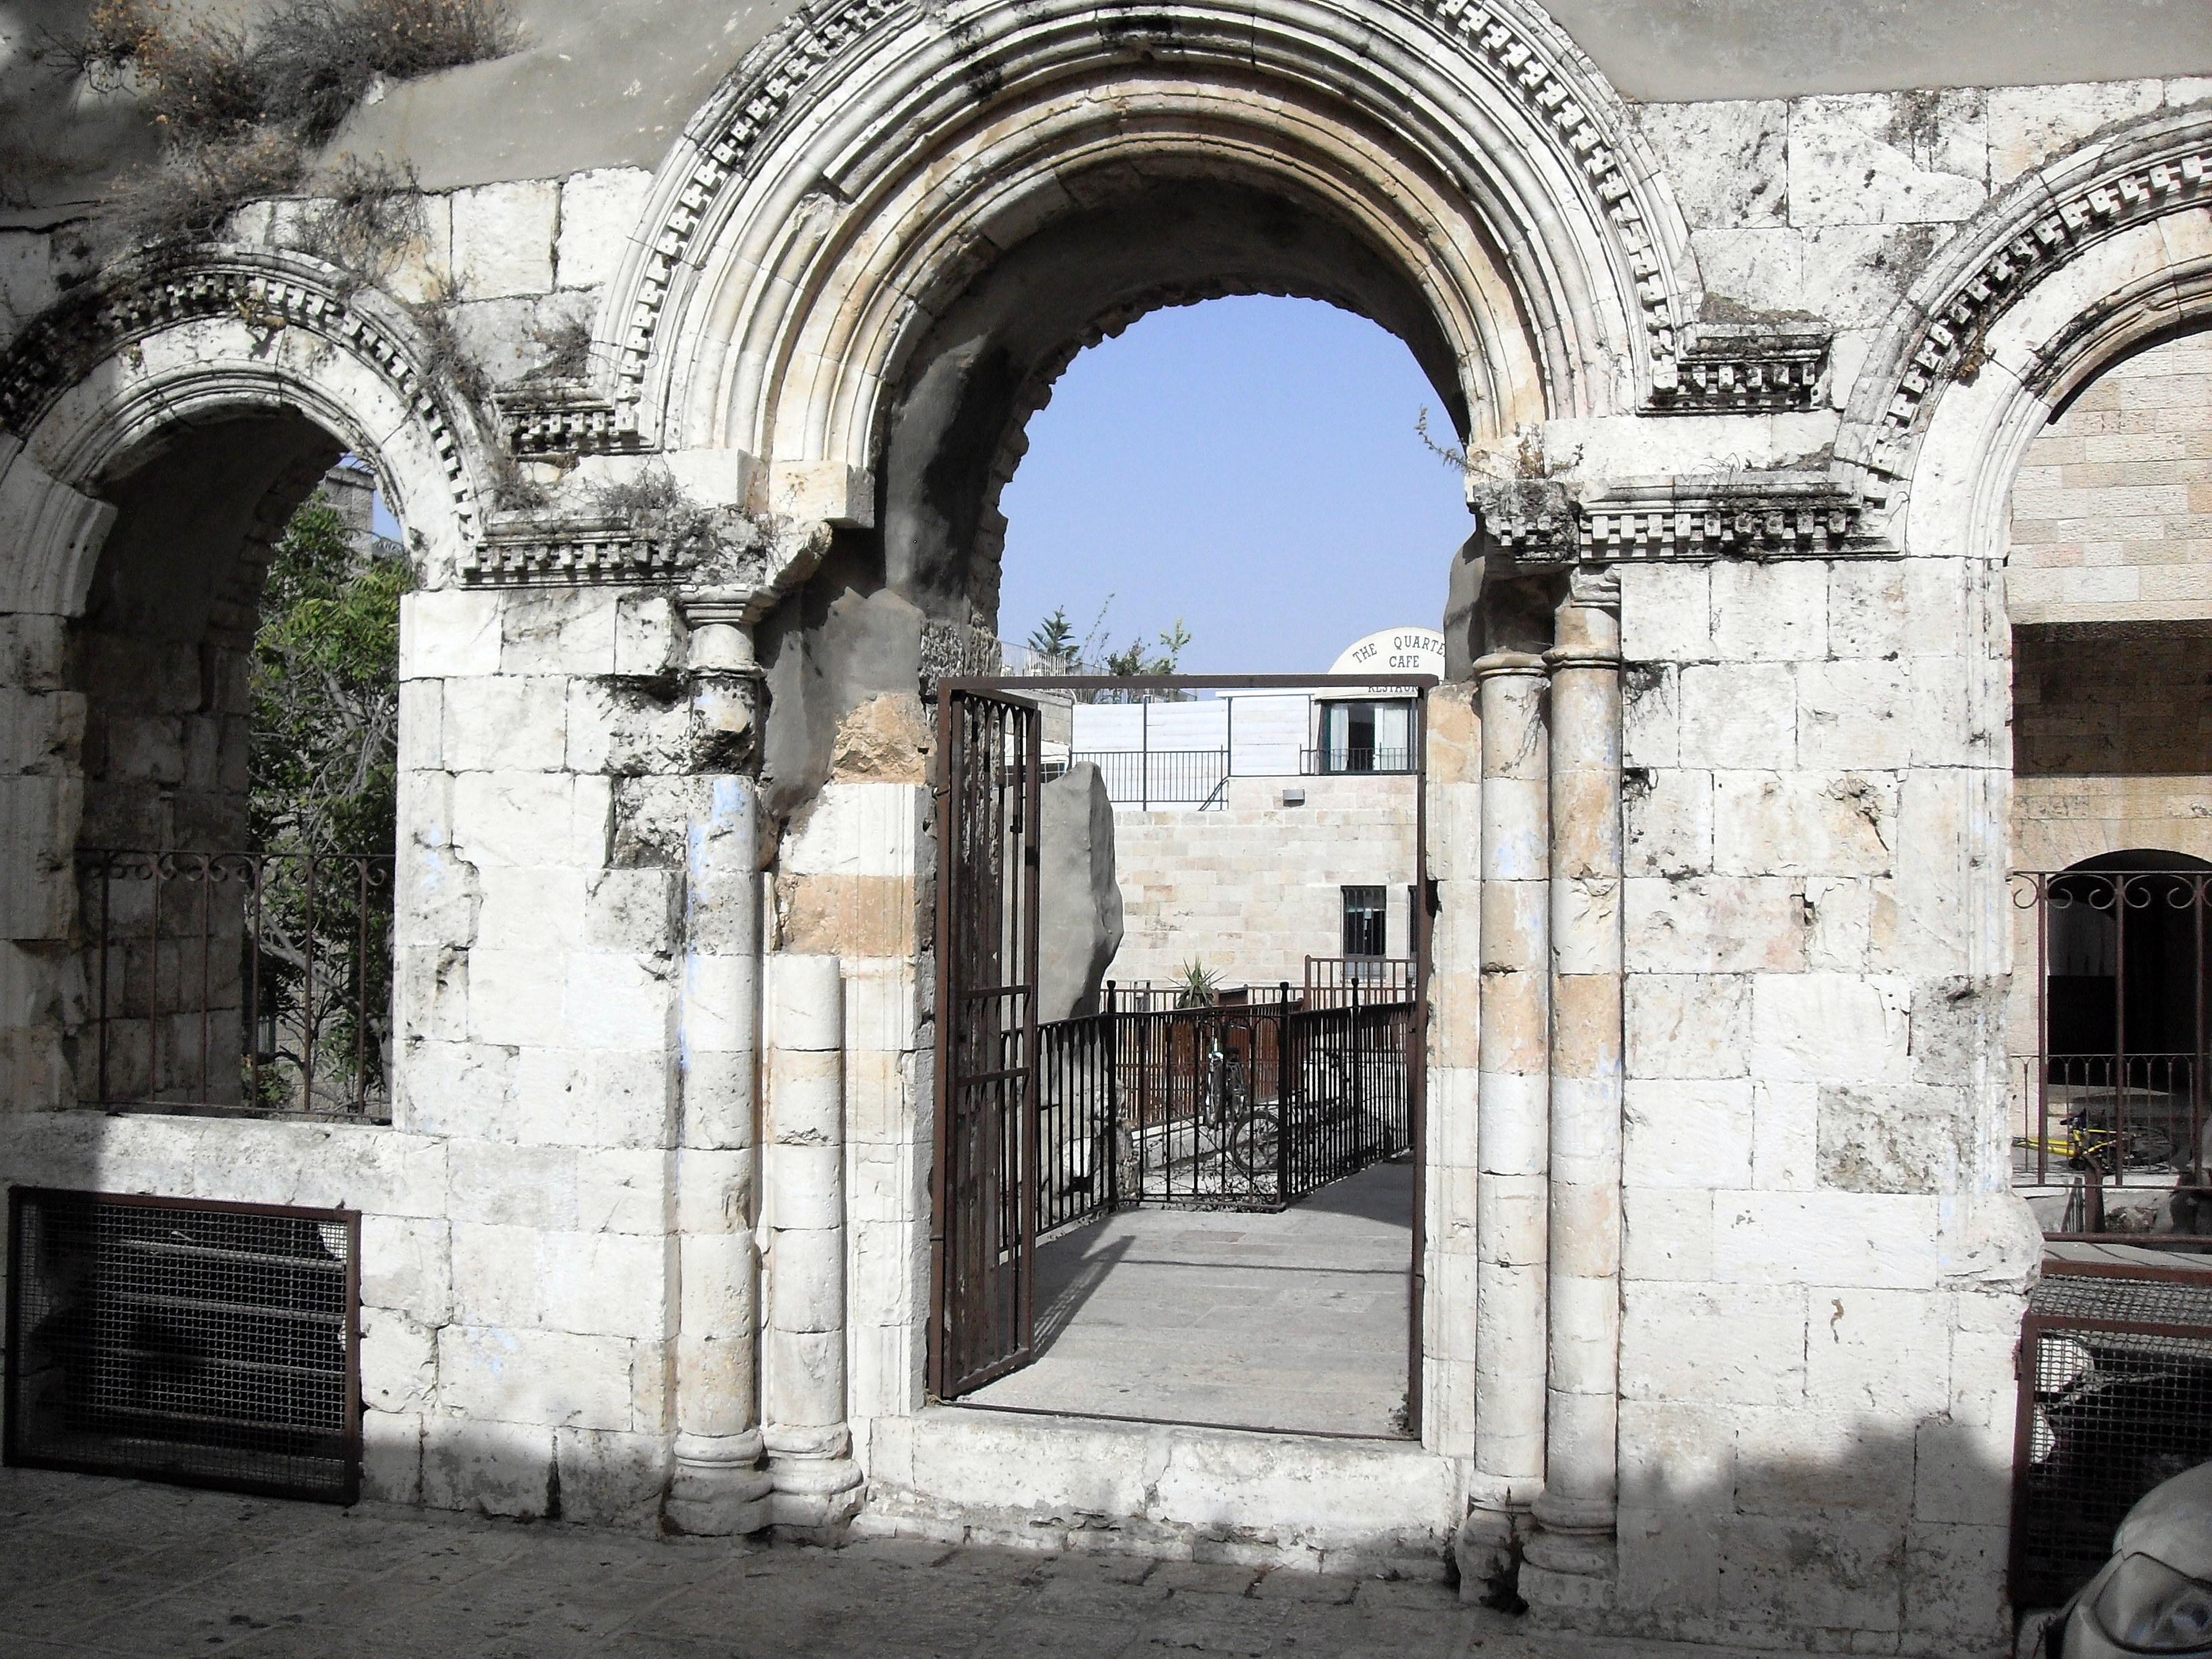 https://upload.wikimedia.org/wikipedia/commons/f/f9/Old_Jerusalem_Tiferet_Yisrael_Synagogue_Gate.JPG